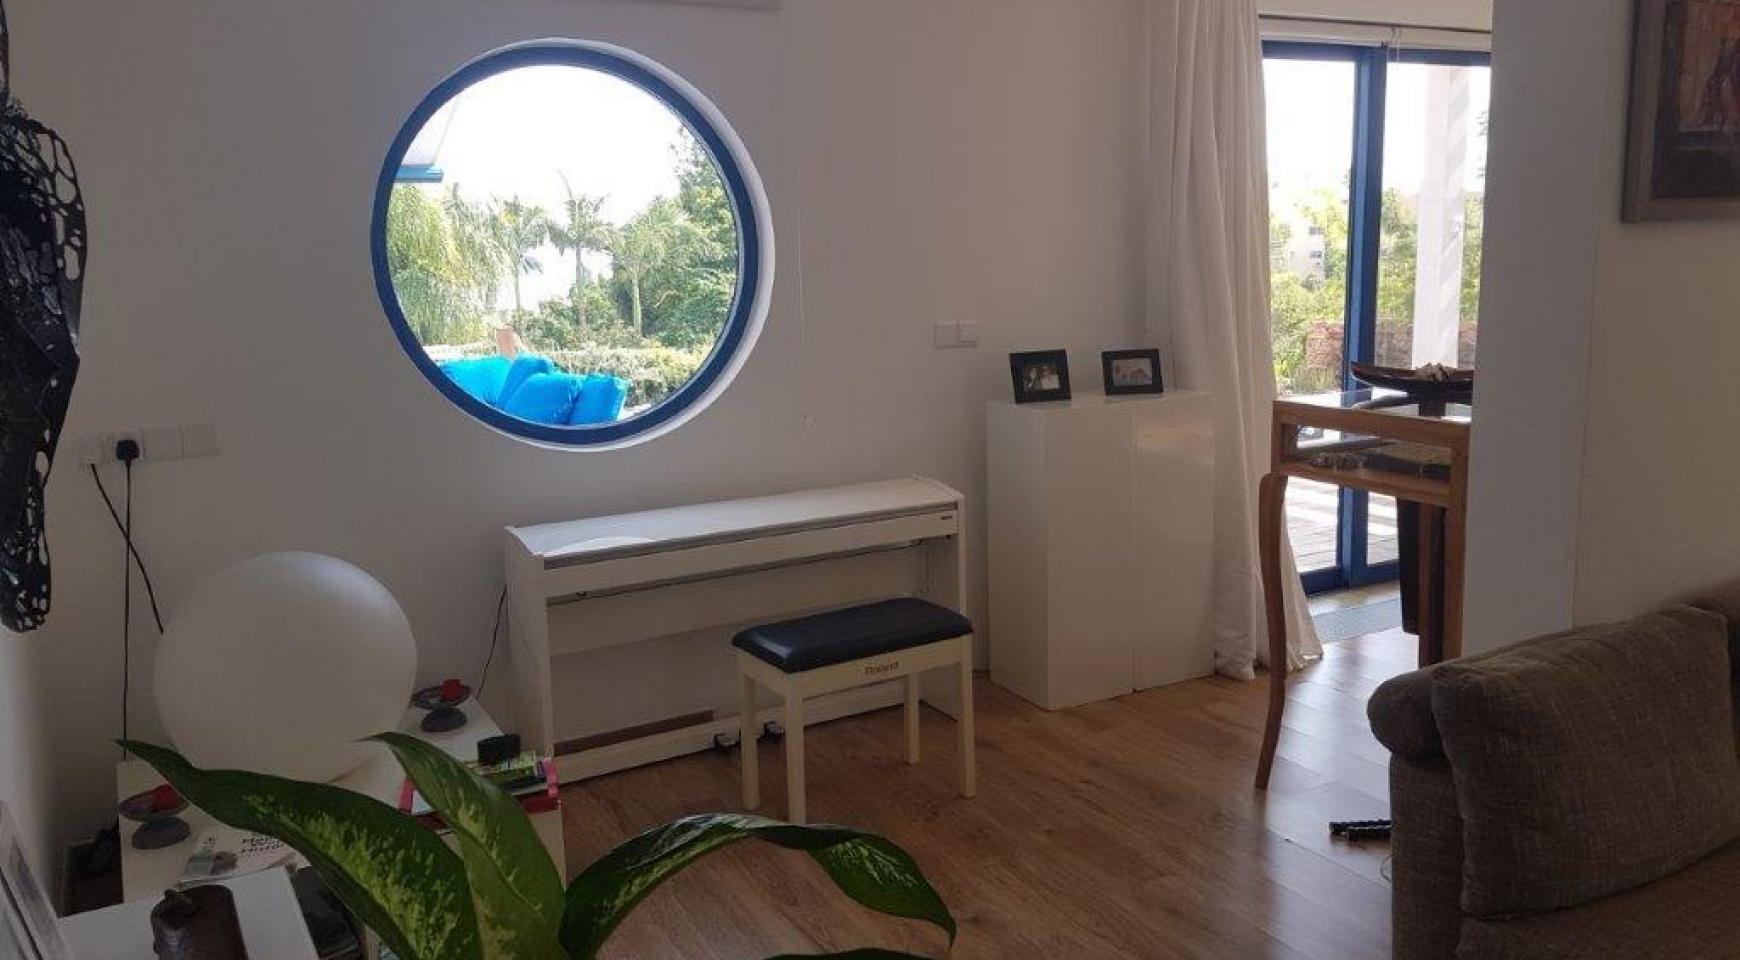 5-Спальная Вилла с видом на Море в районе  Agios Tychonas - 16